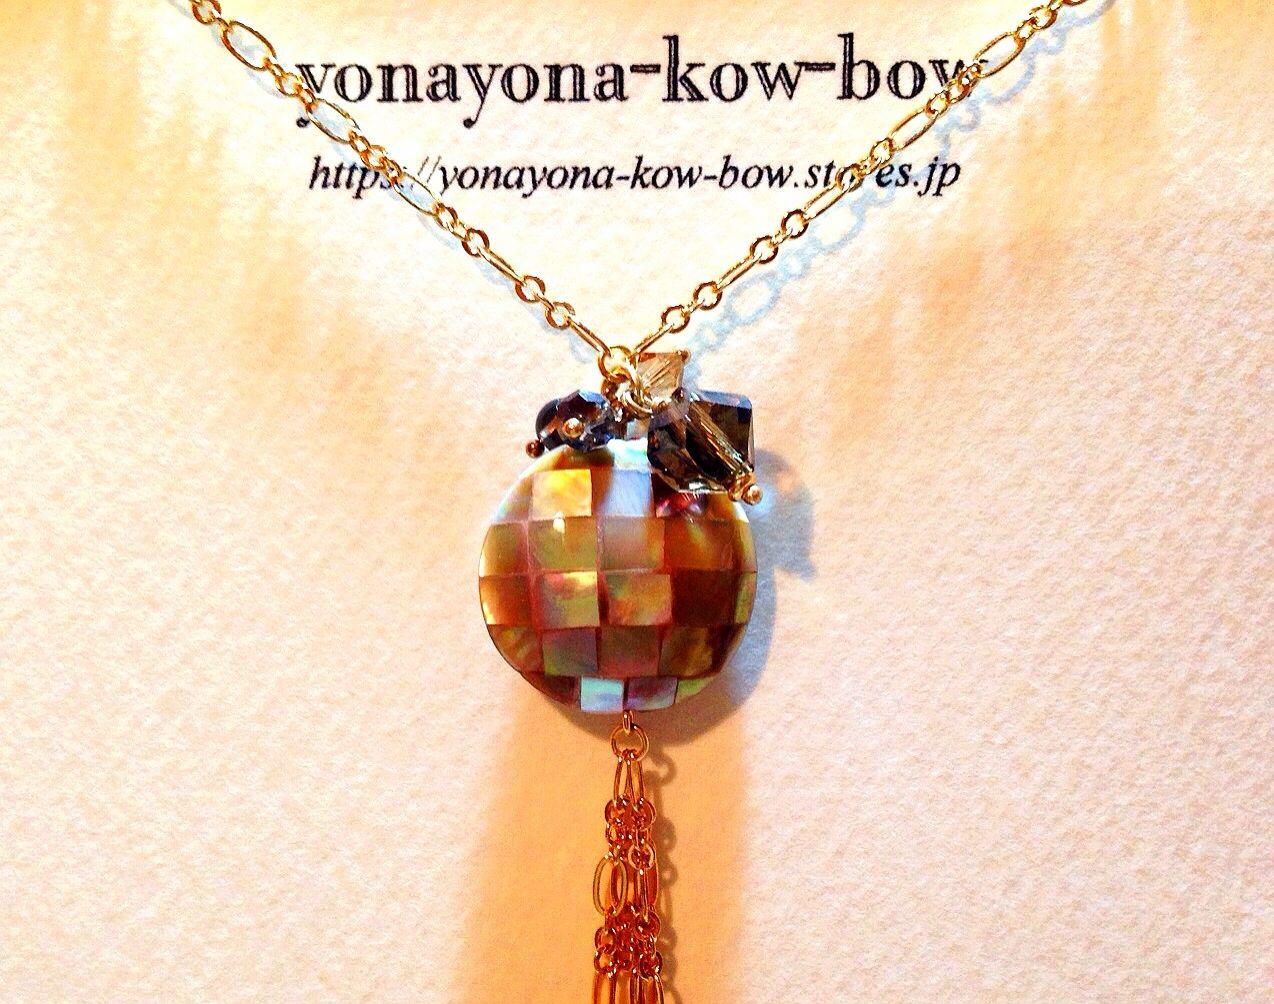 yonayona-kow-bow